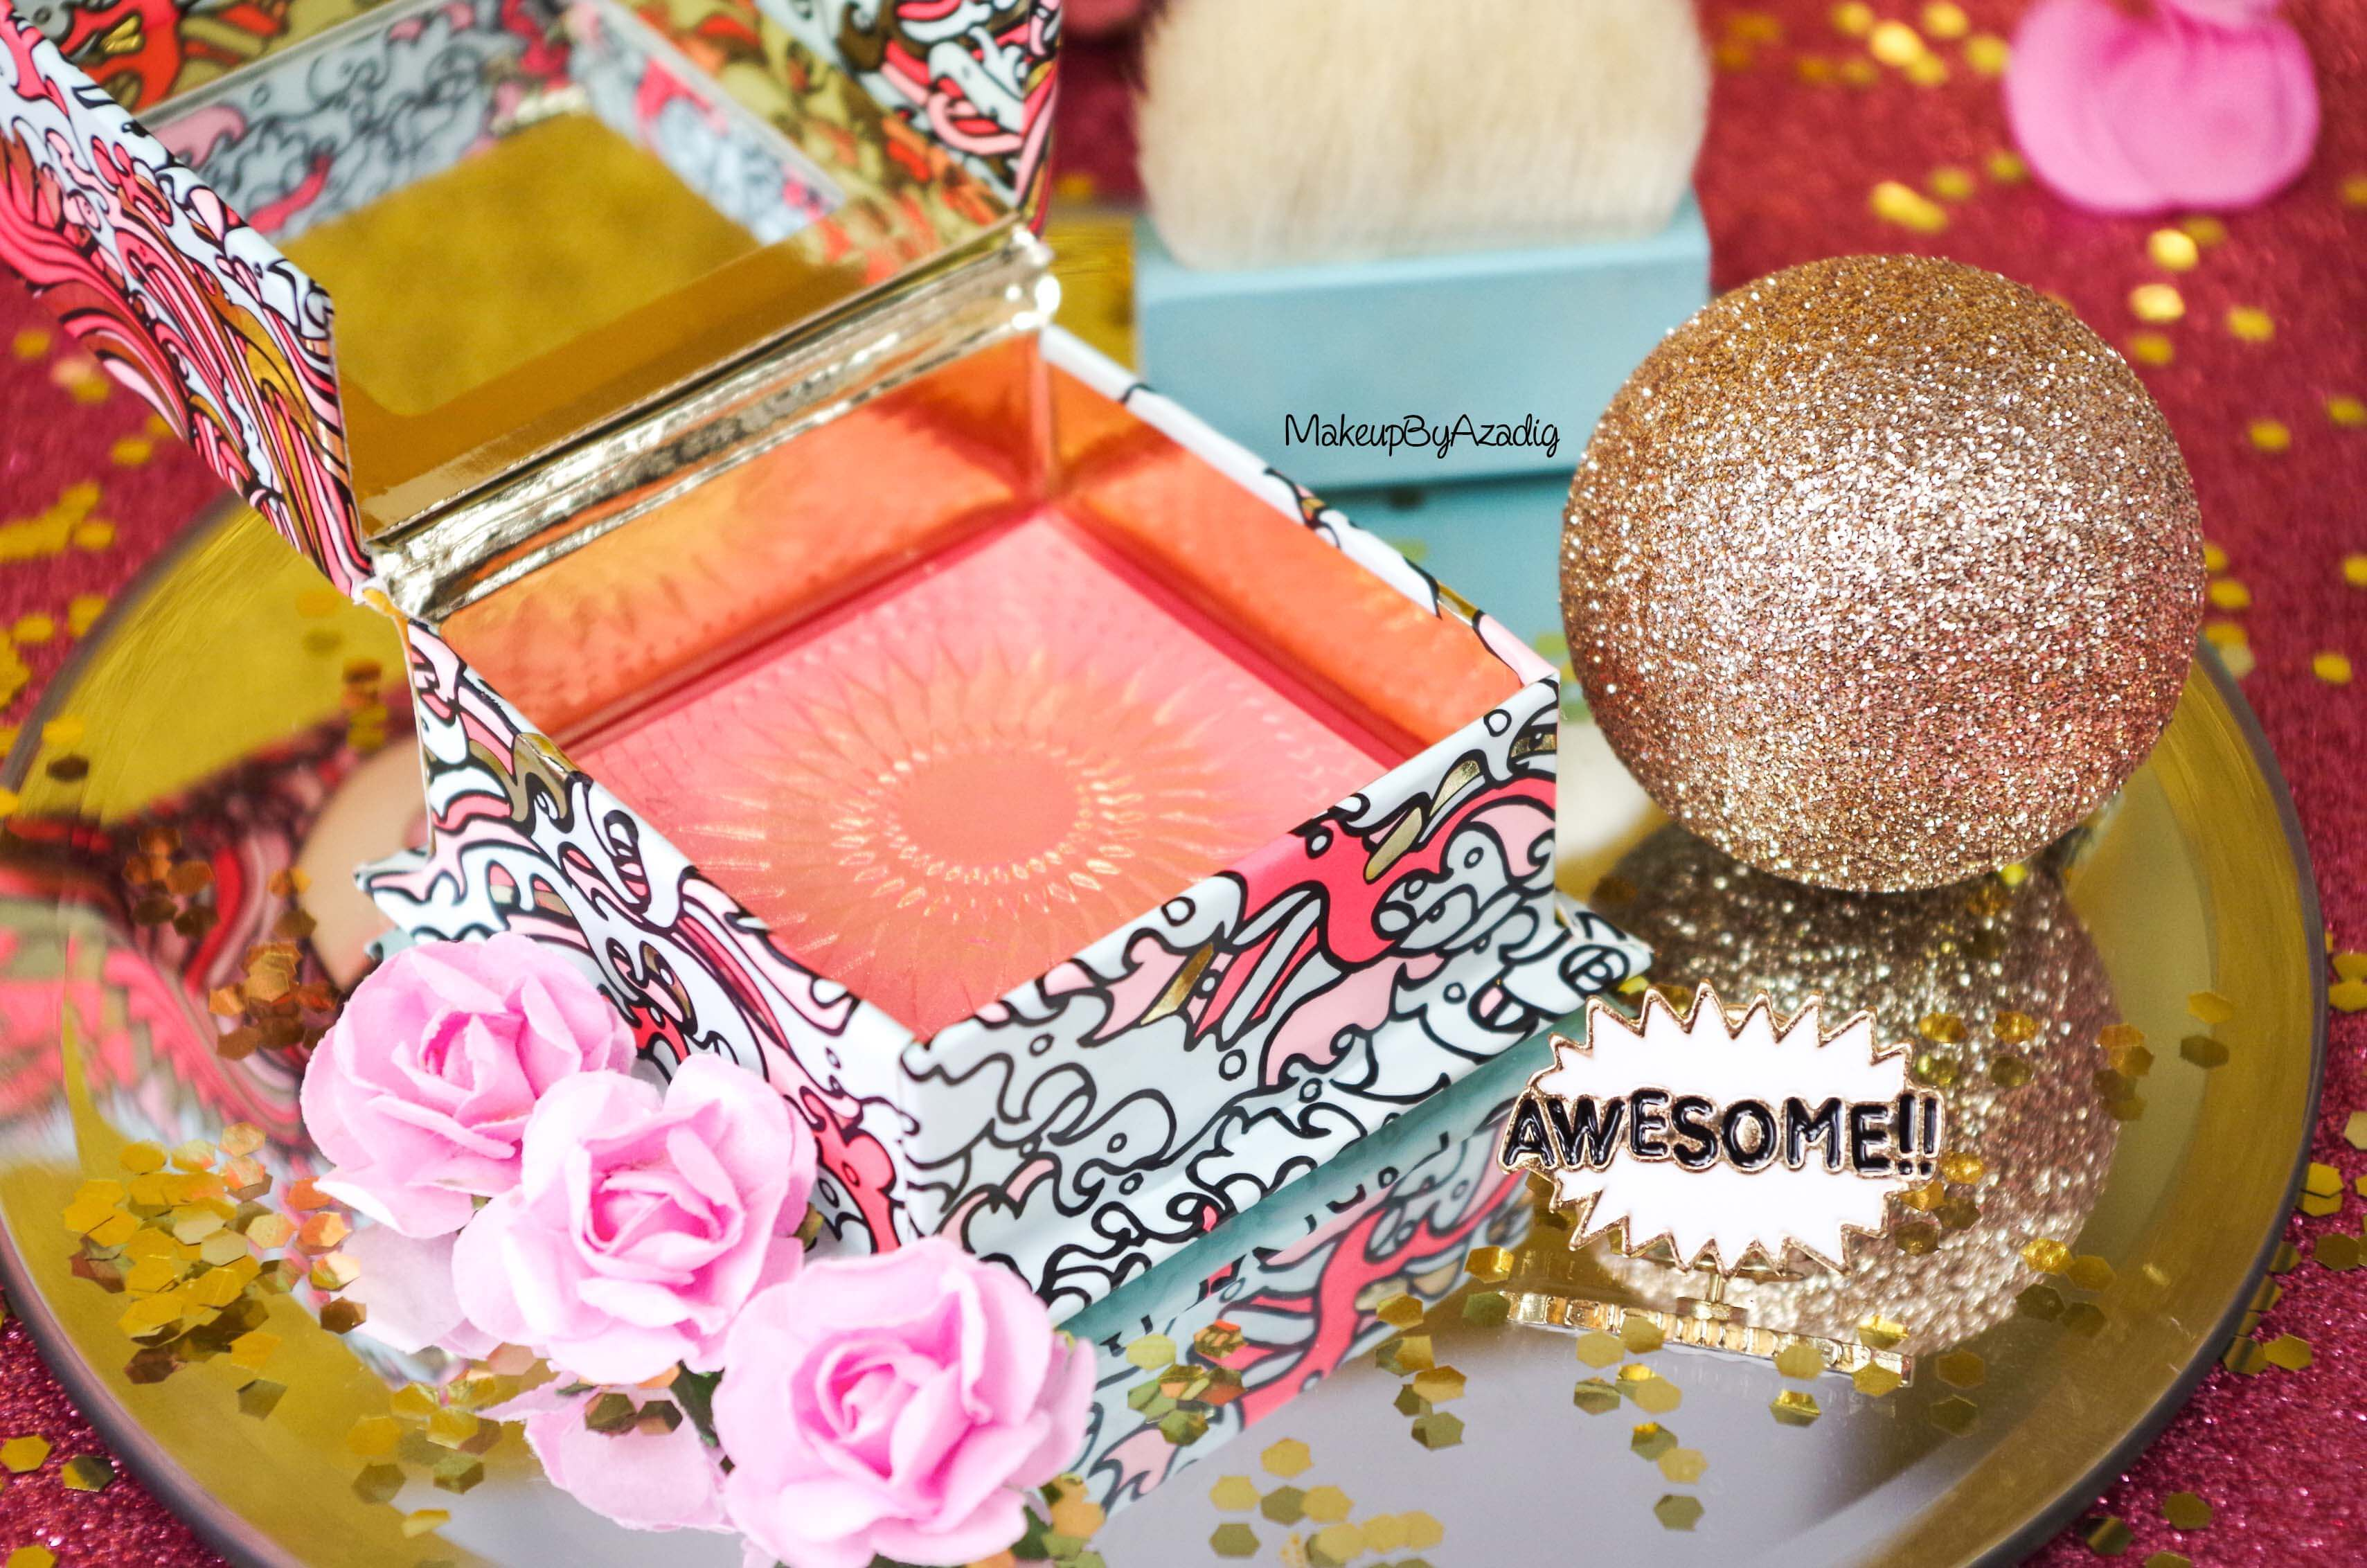 teinte-revue-review-blush-benefit-galifornia-san-francisco-sunny-golden-pink-blush-avis-prix-sephora-makeupbyazadig-coachella